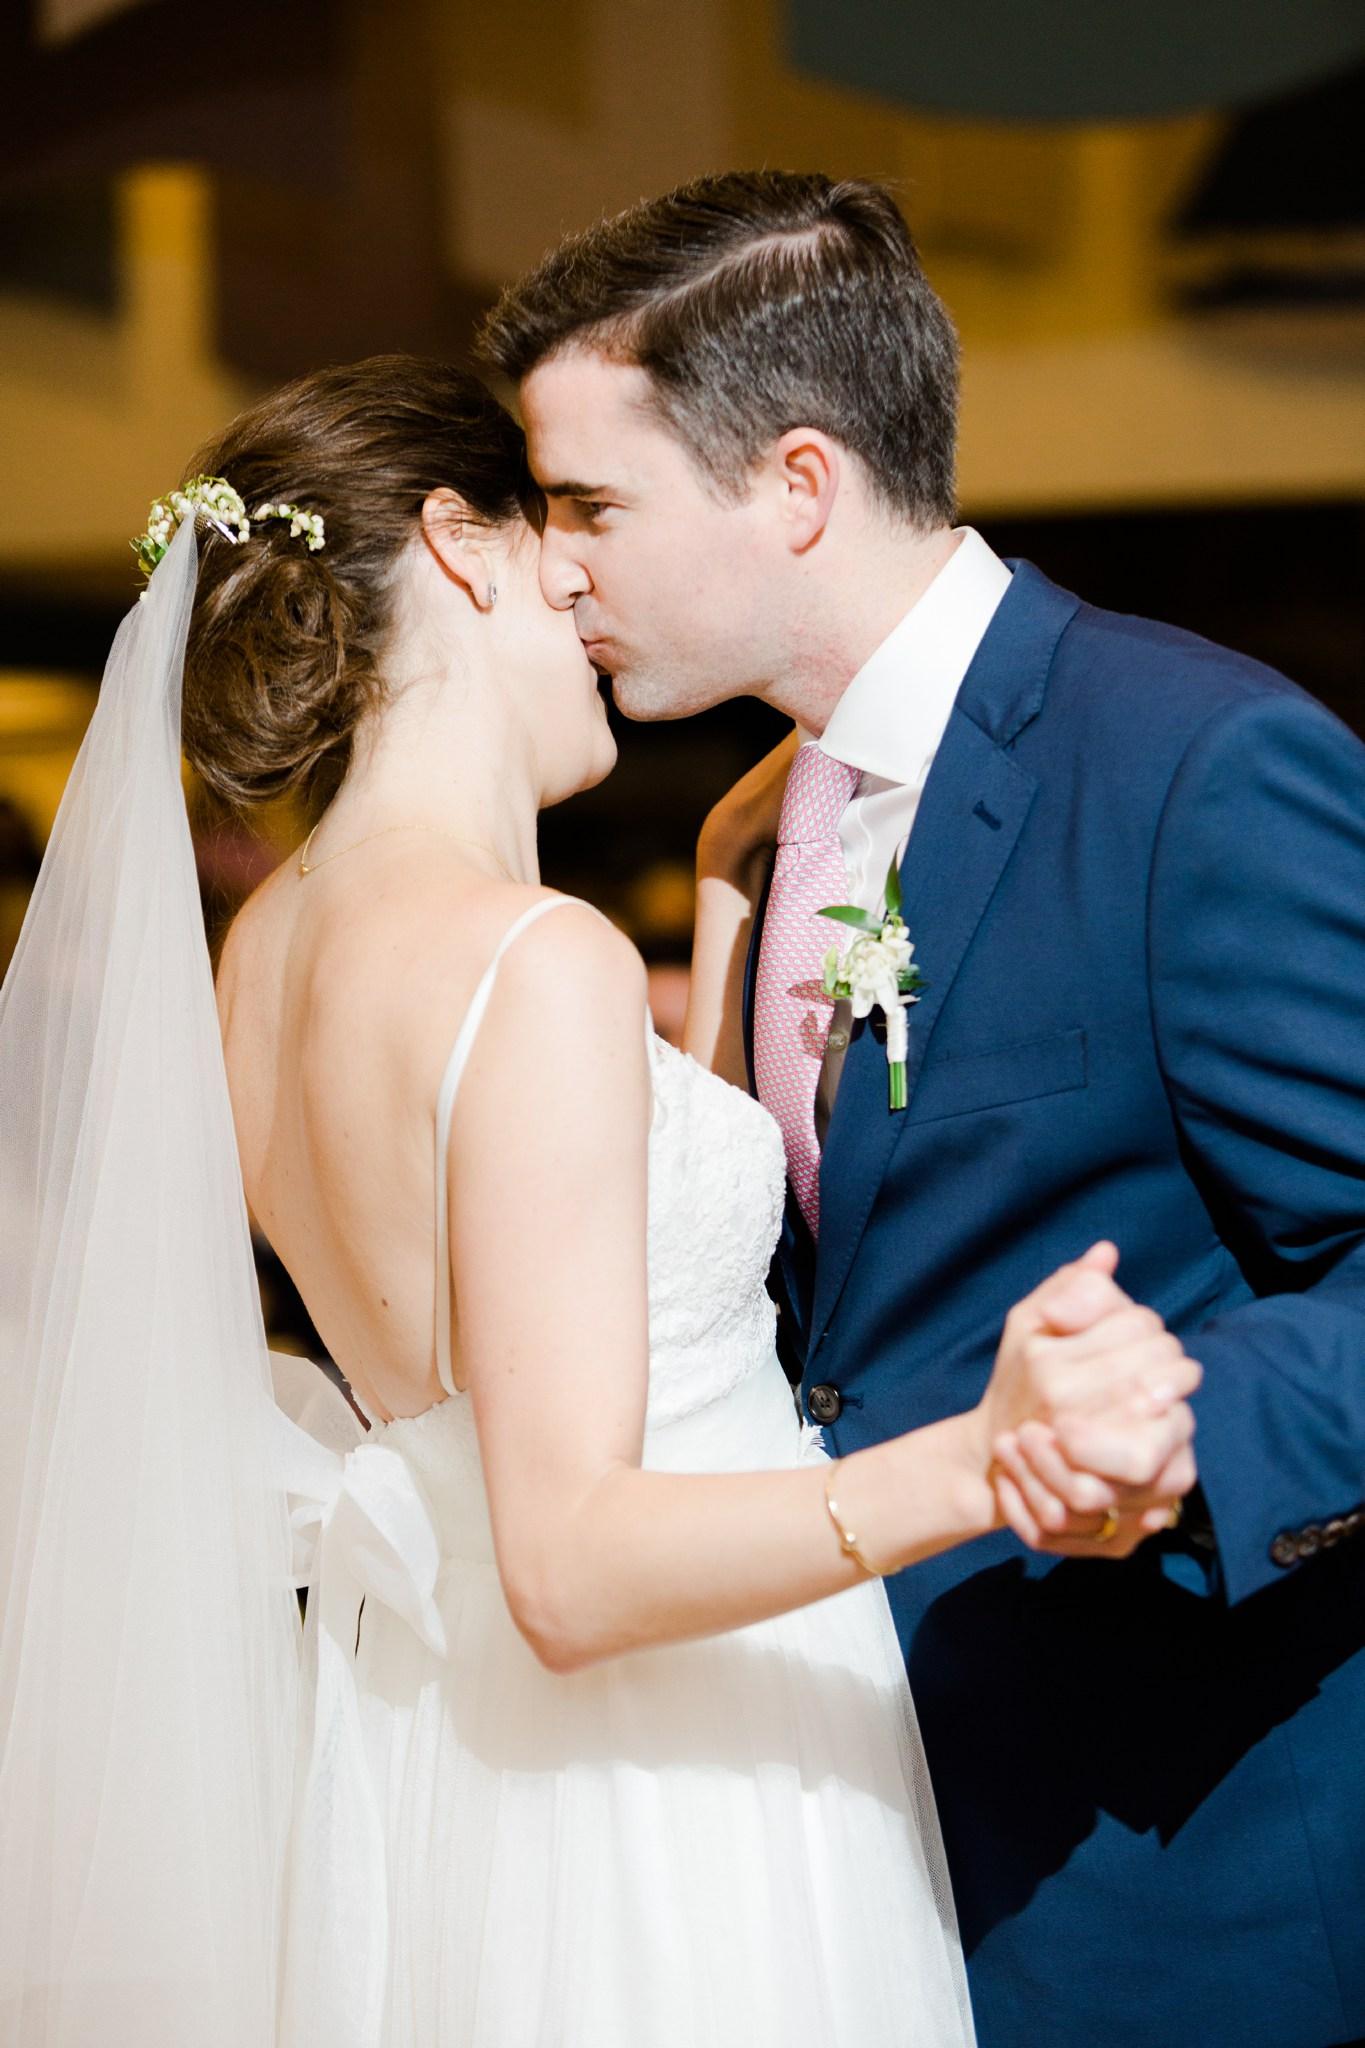 cape_cod_wedding_deborah_zoe_Photography_00067.JPG